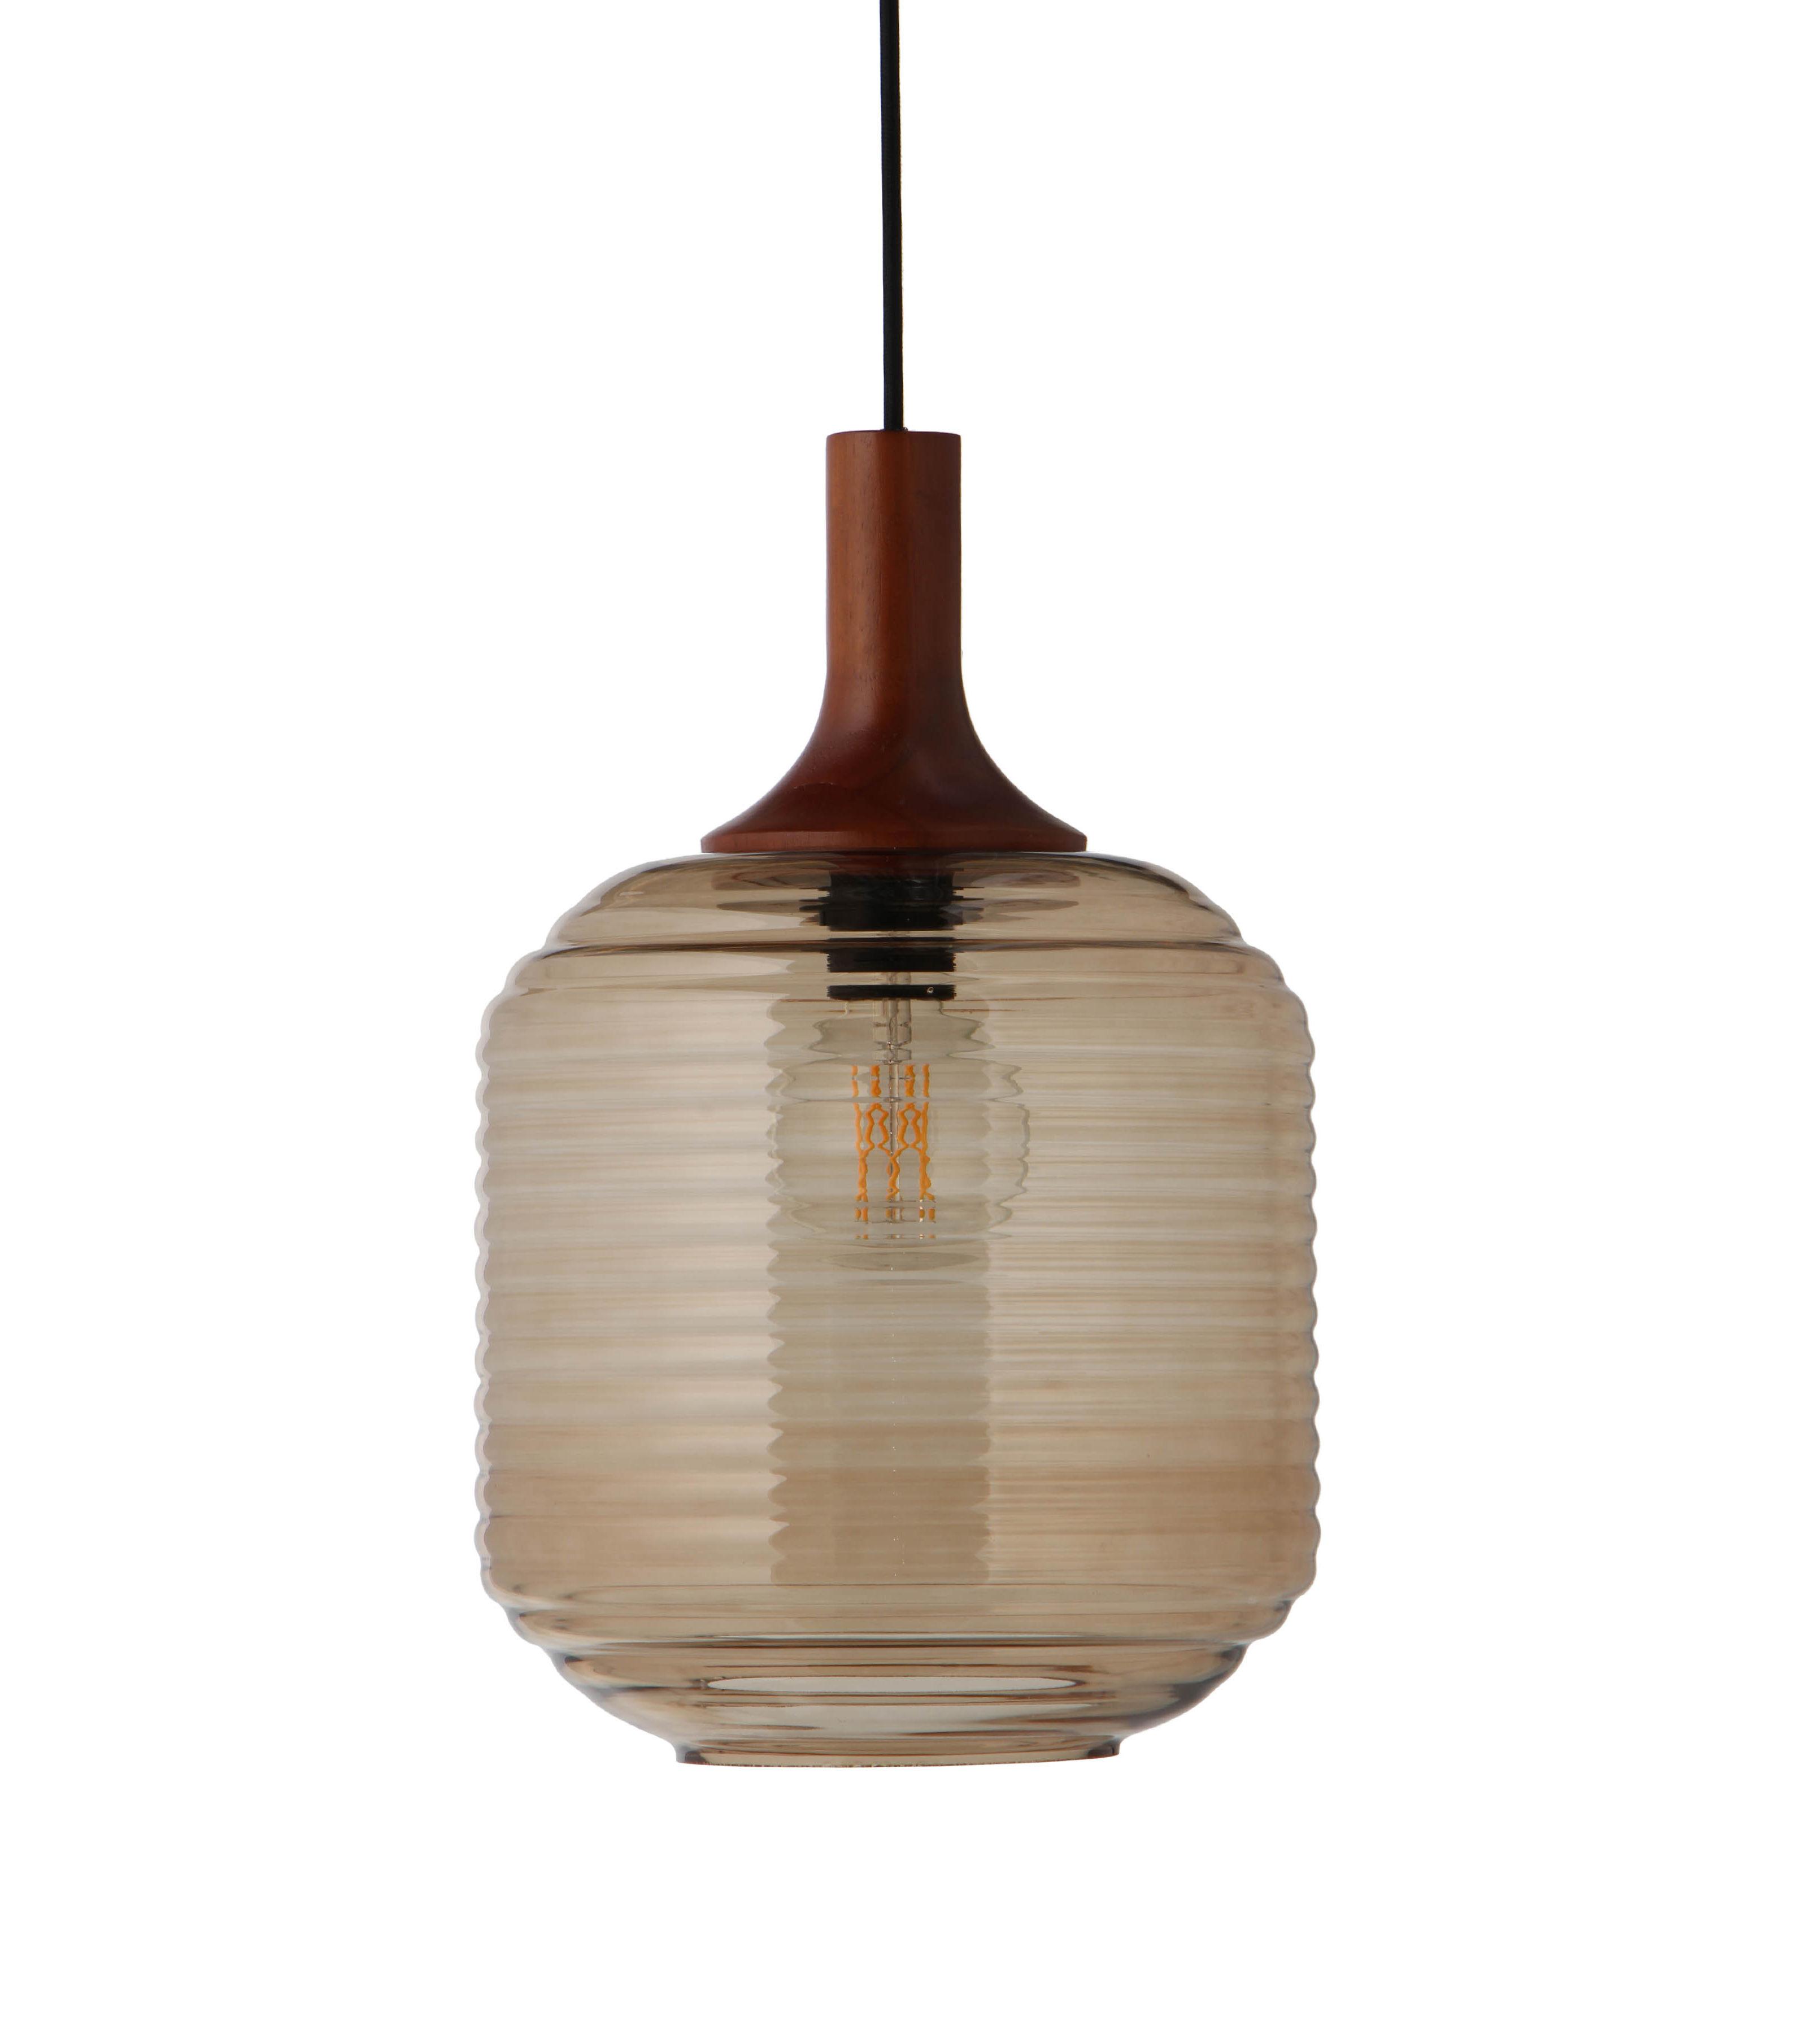 Leuchten - Pendelleuchten - Honey Large Pendelleuchte / Glas & Holz - Frandsen - Bernsteinfarben / Holz, dunkel - Bois d'hévéa teinté, Glas